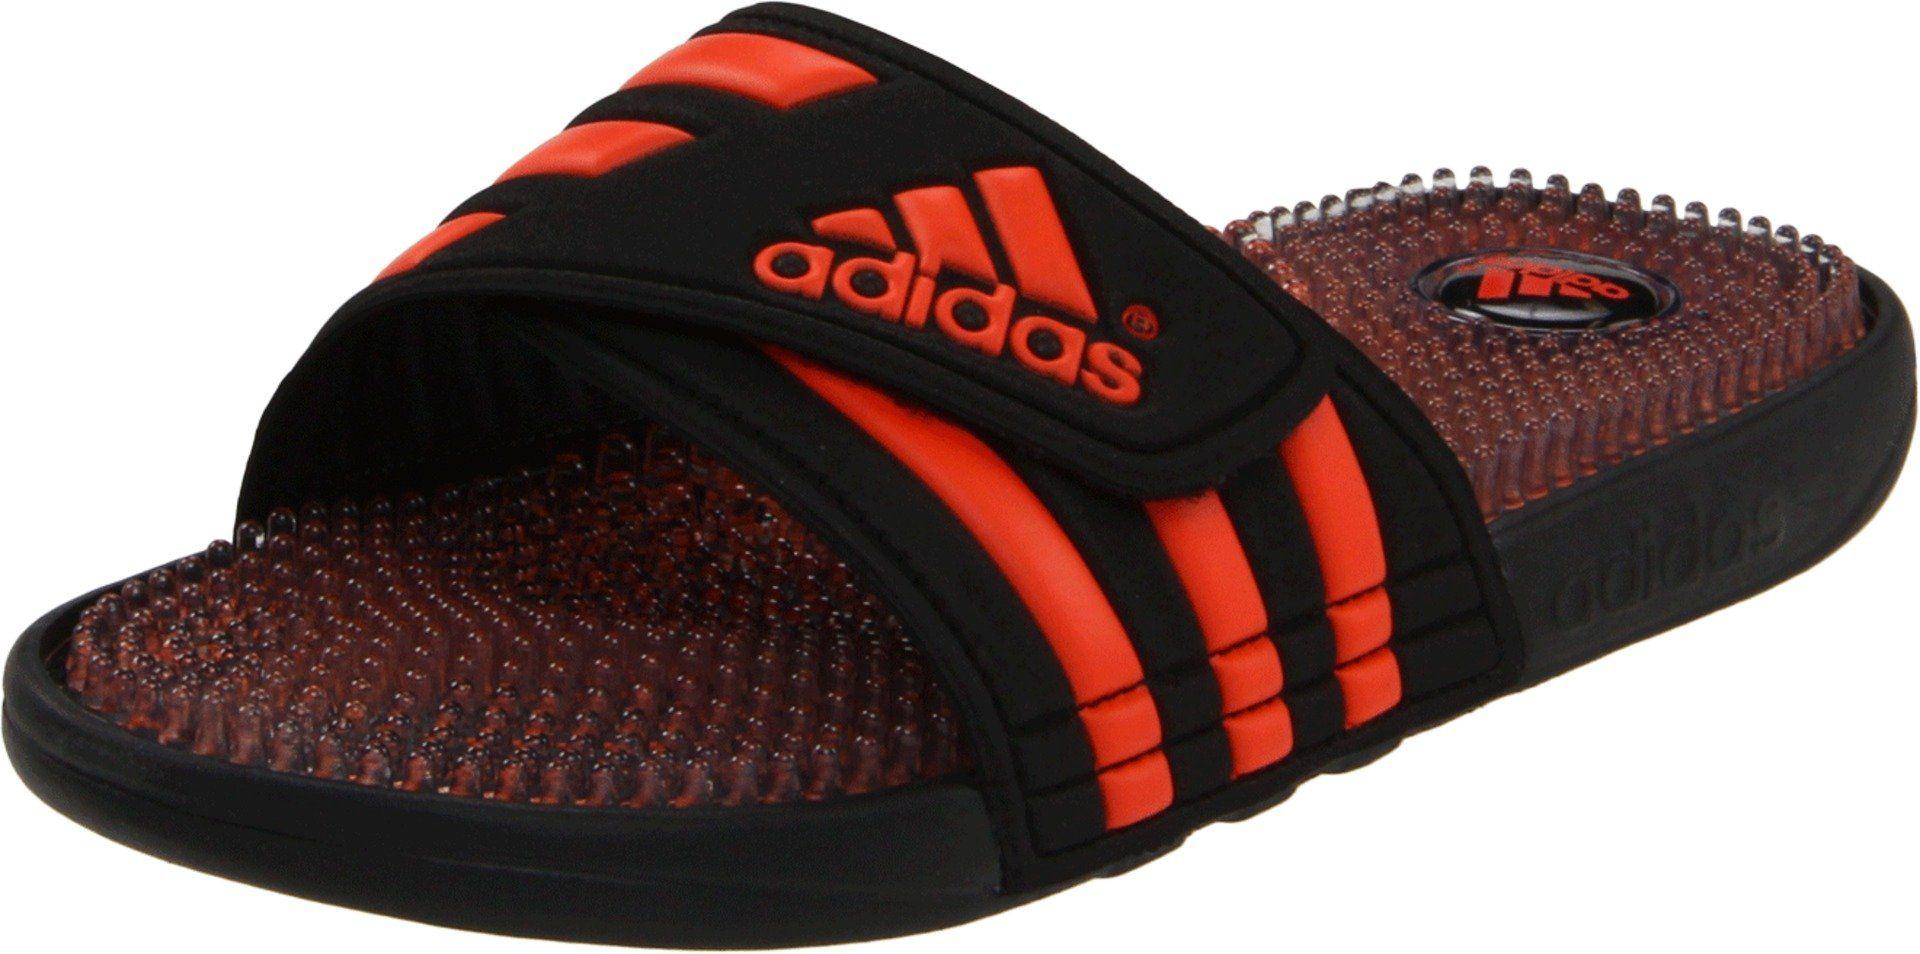 83ac492b2d525 Amazon.com: adidas Performance Men's Adissage Fade Slide Sandal ...